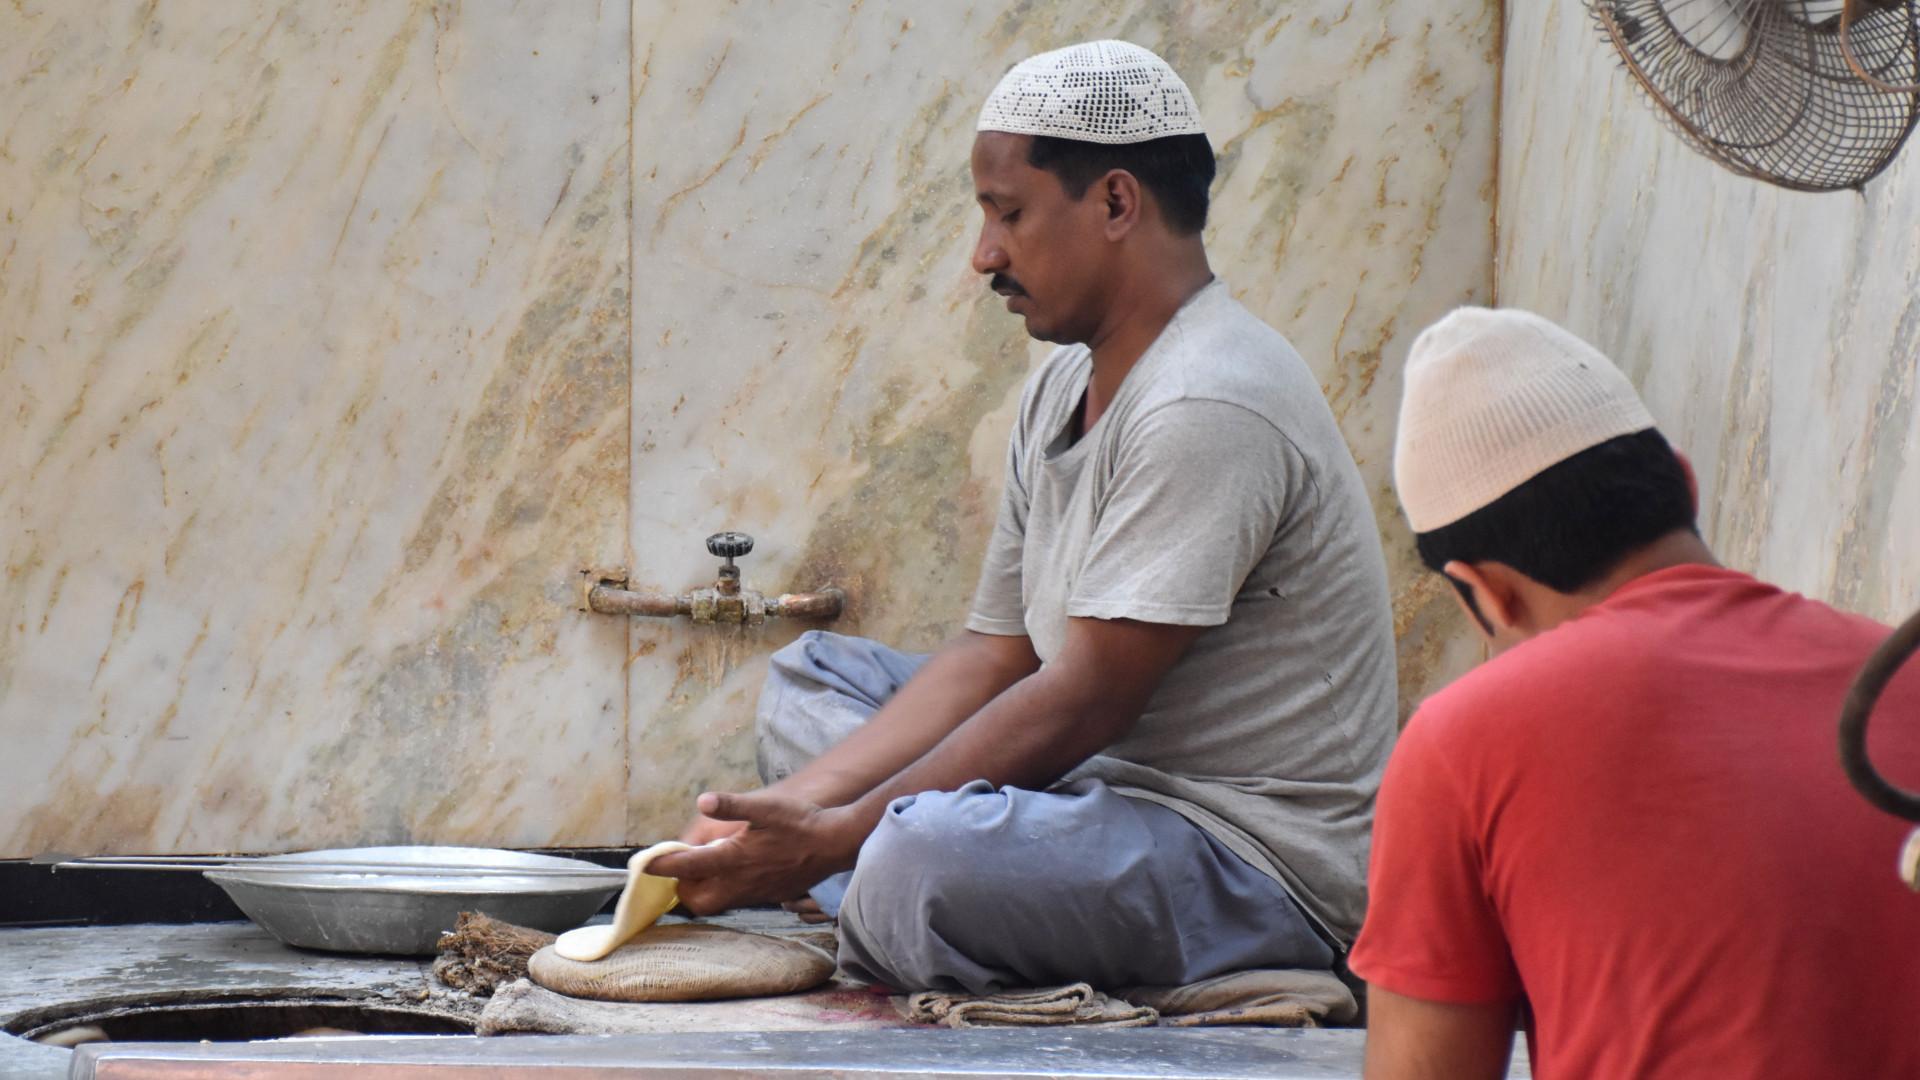 Karim bread